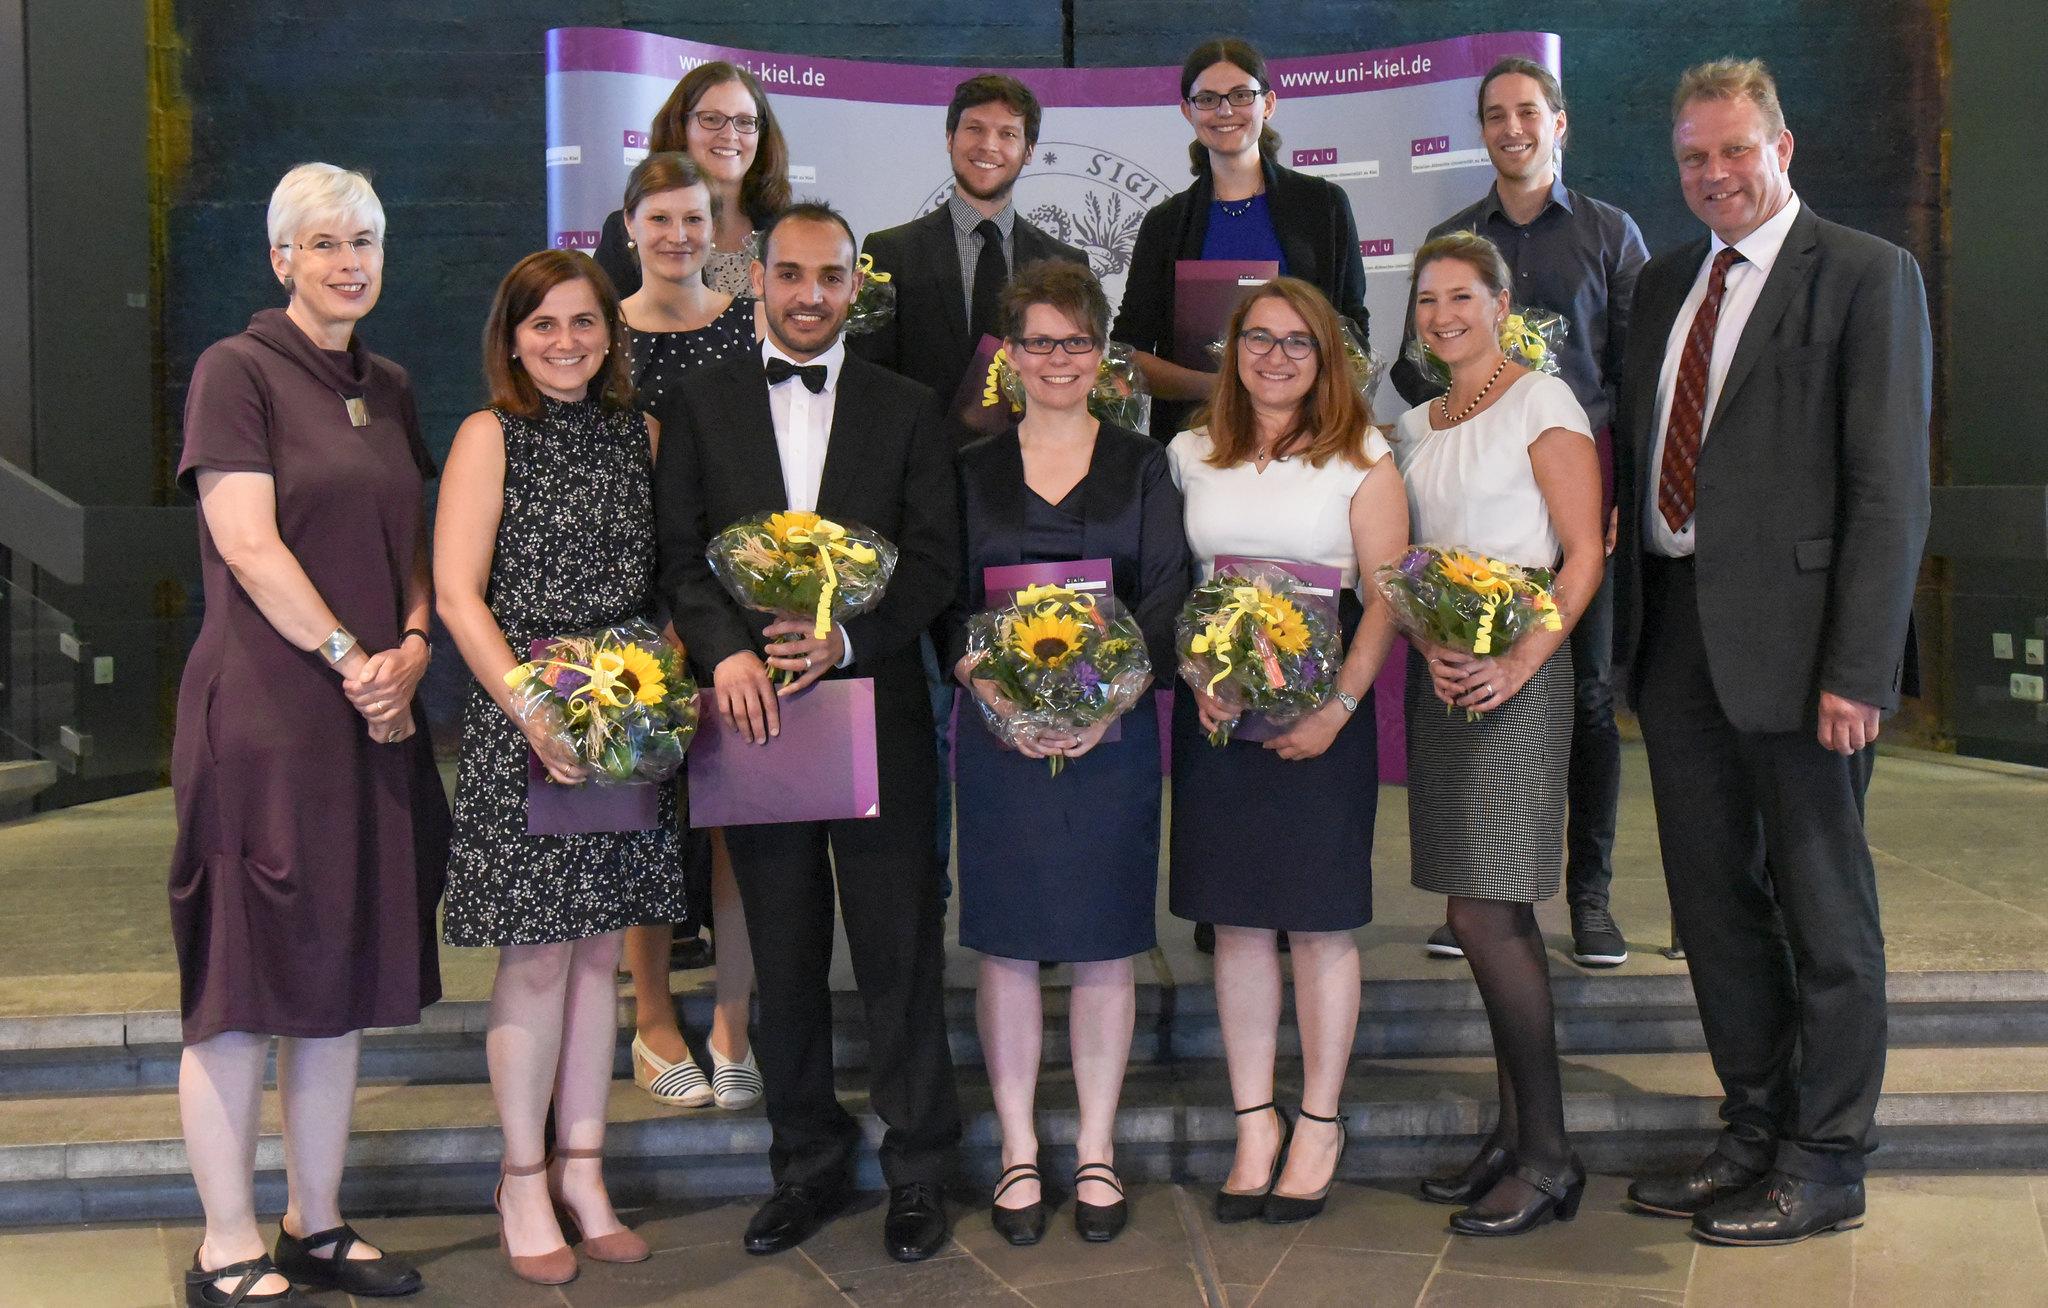 Fakultätspreise, Genderforschungspreis, DAAD-Preis 2018